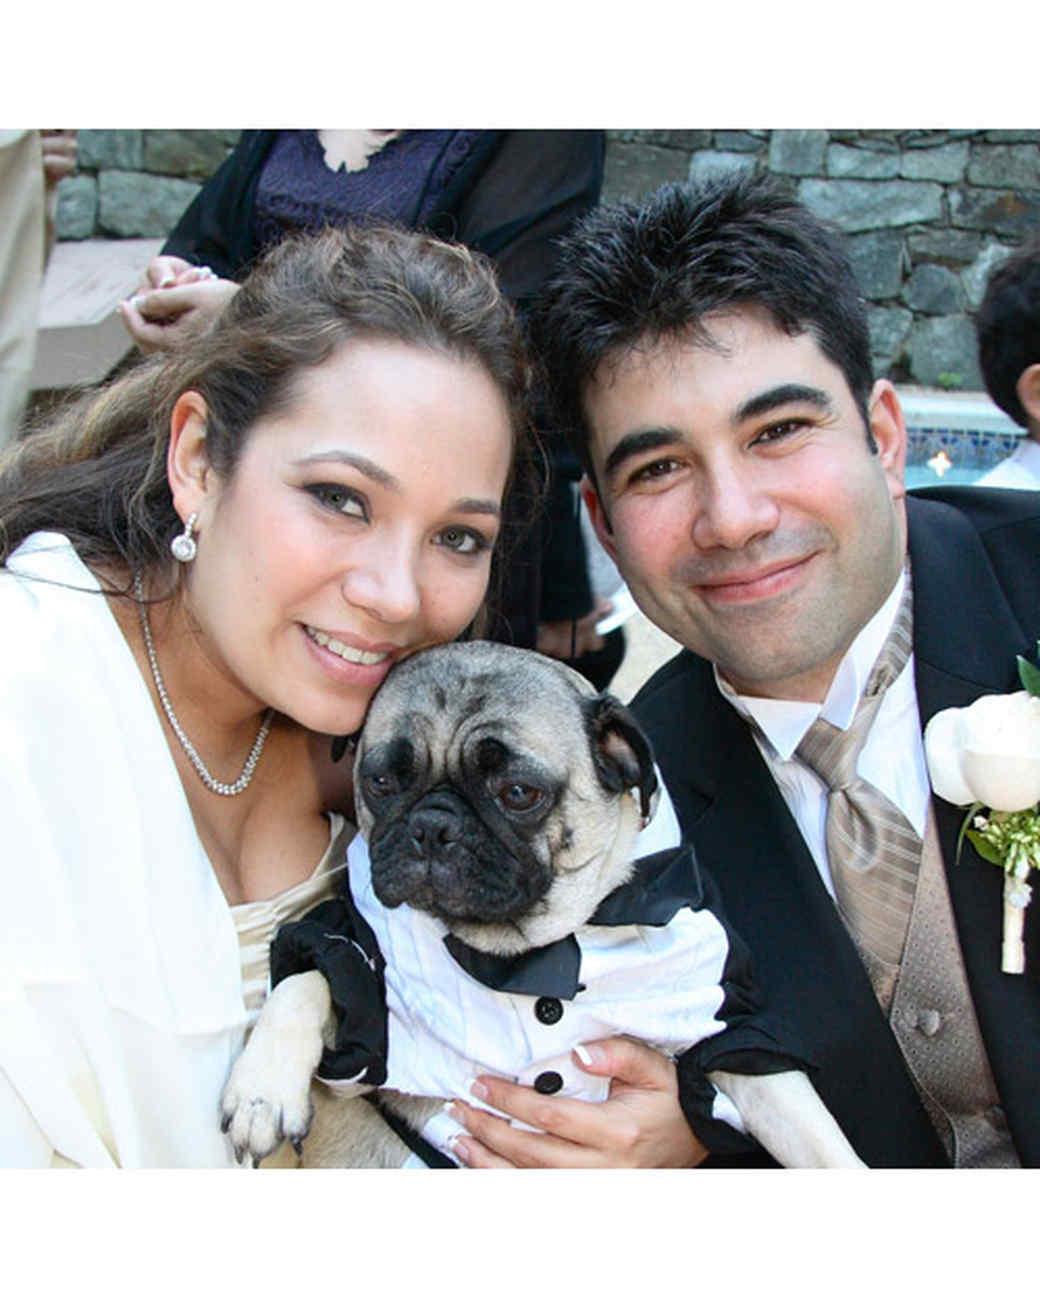 pets_wedding_90786.jpg